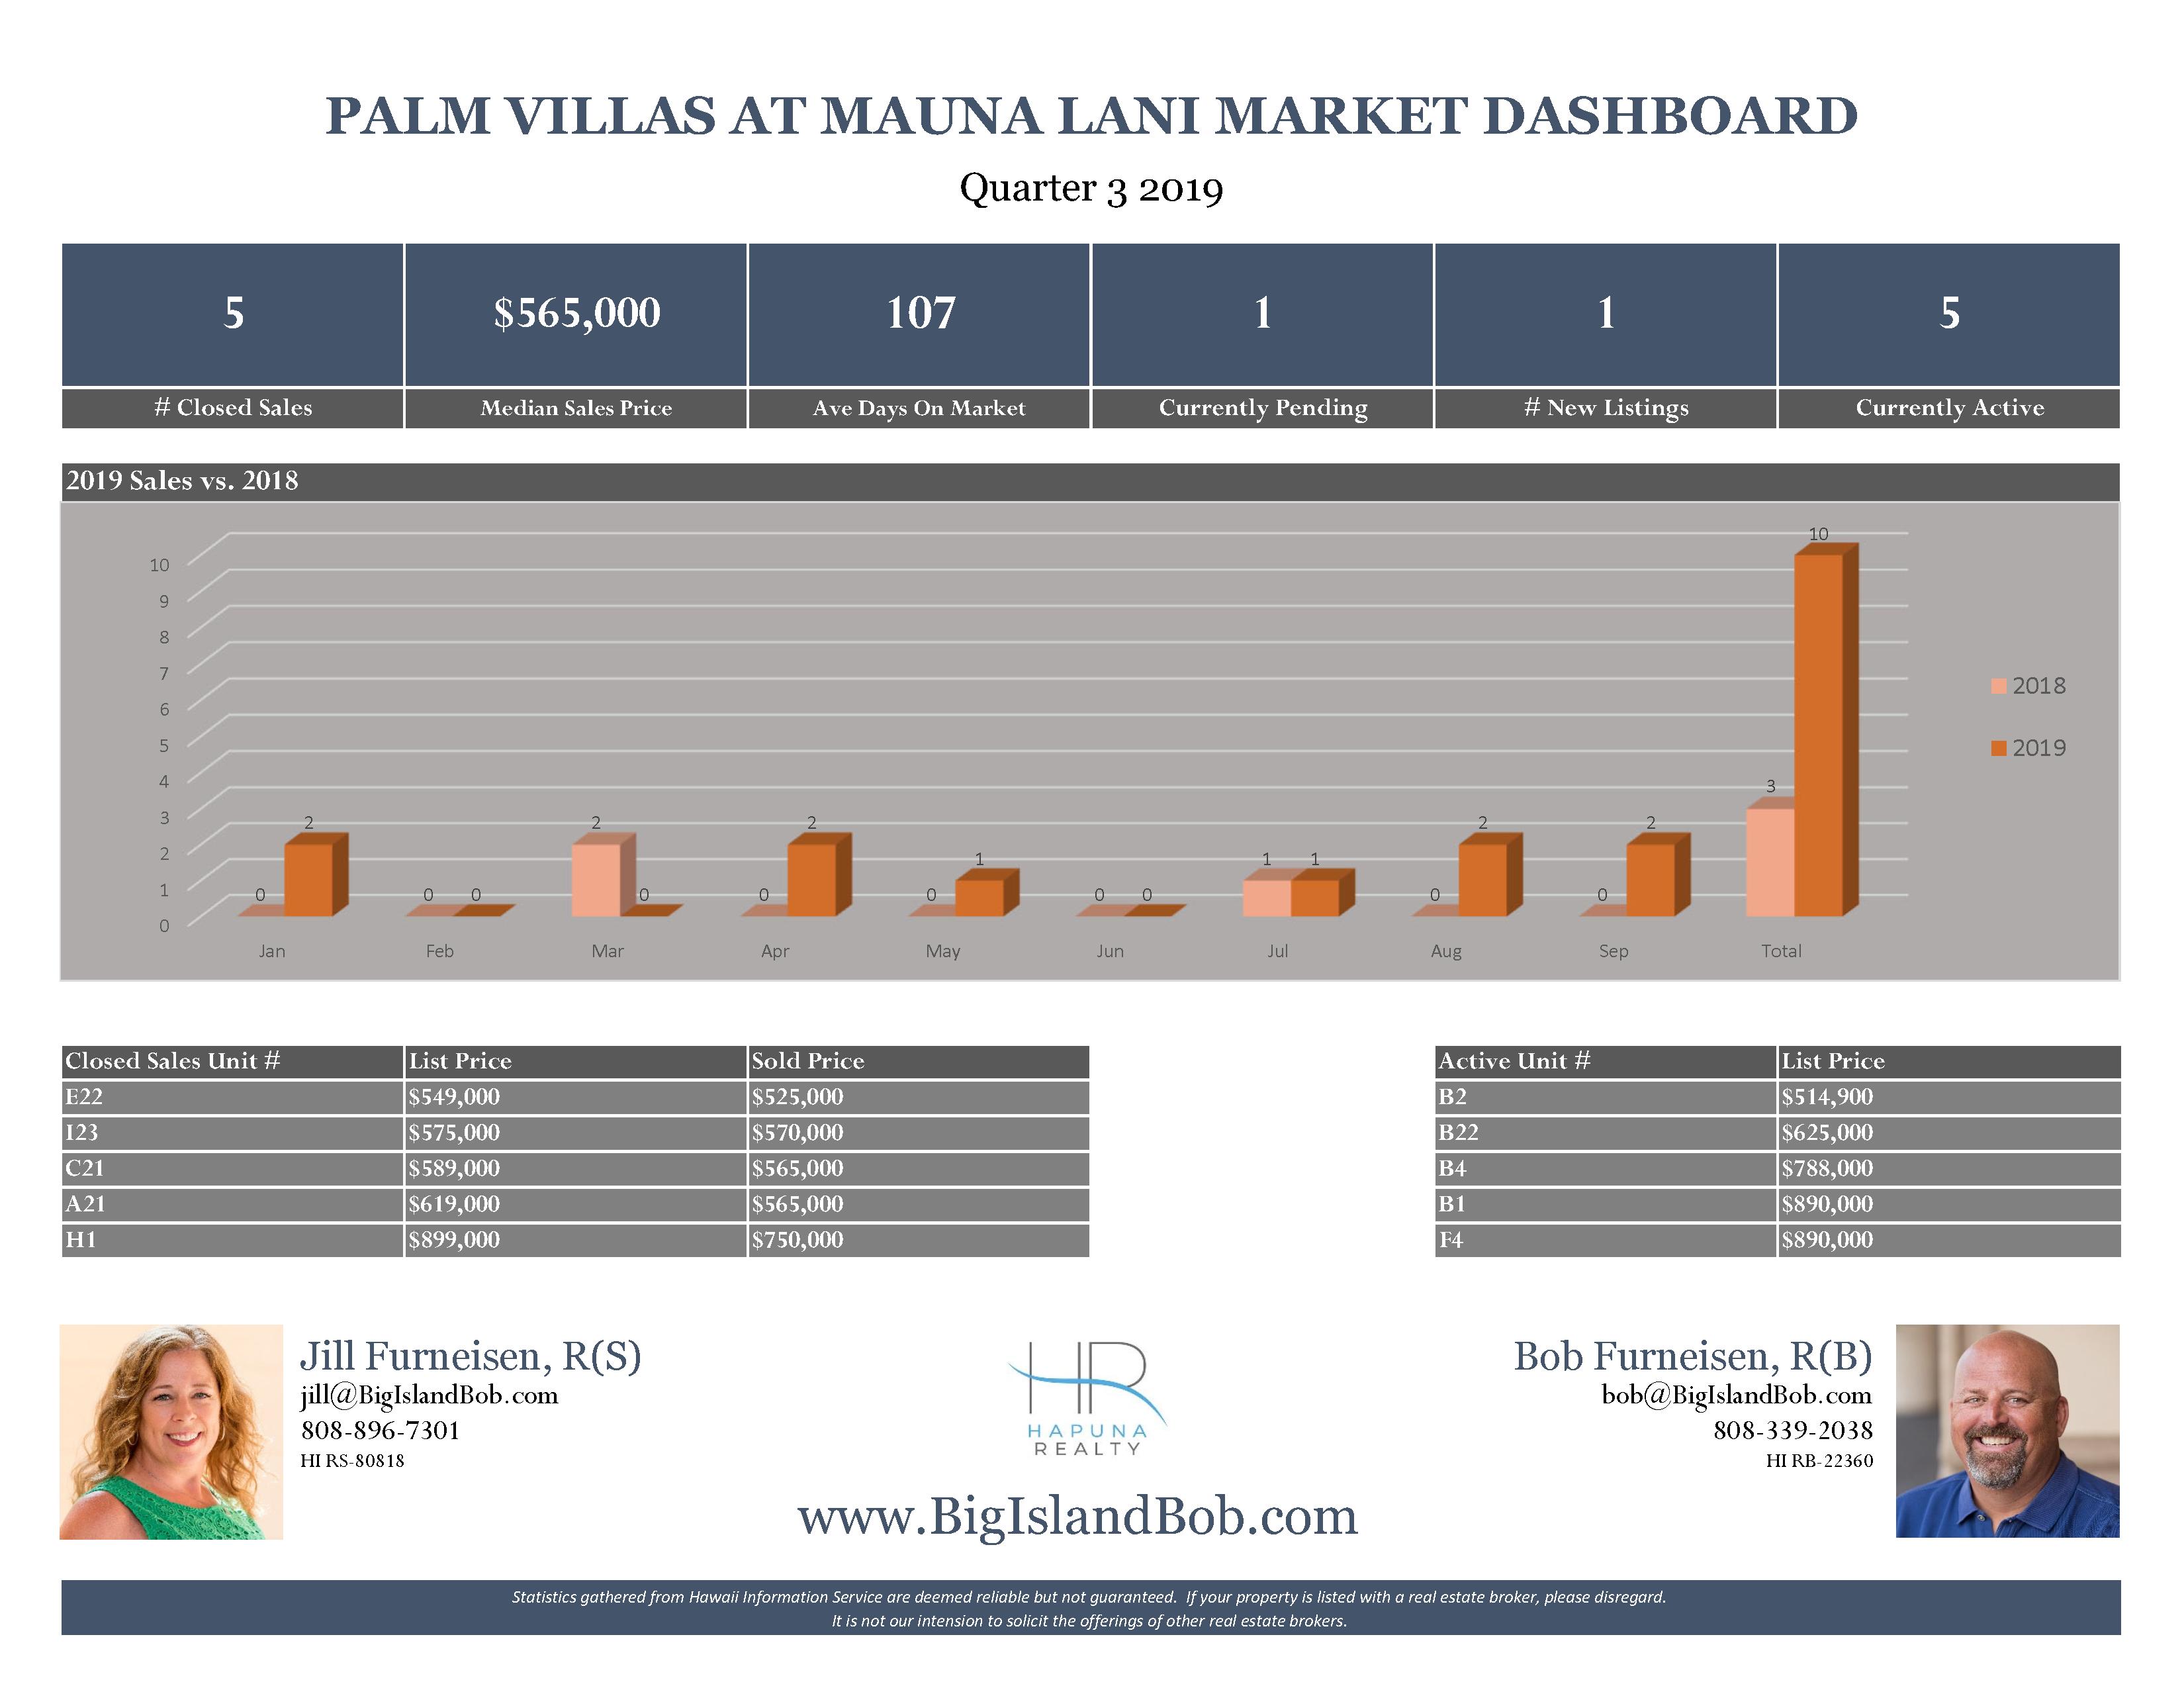 Palm Villas at Mauna Lani Quarter 3 2019 Real Estate Market Dashboard